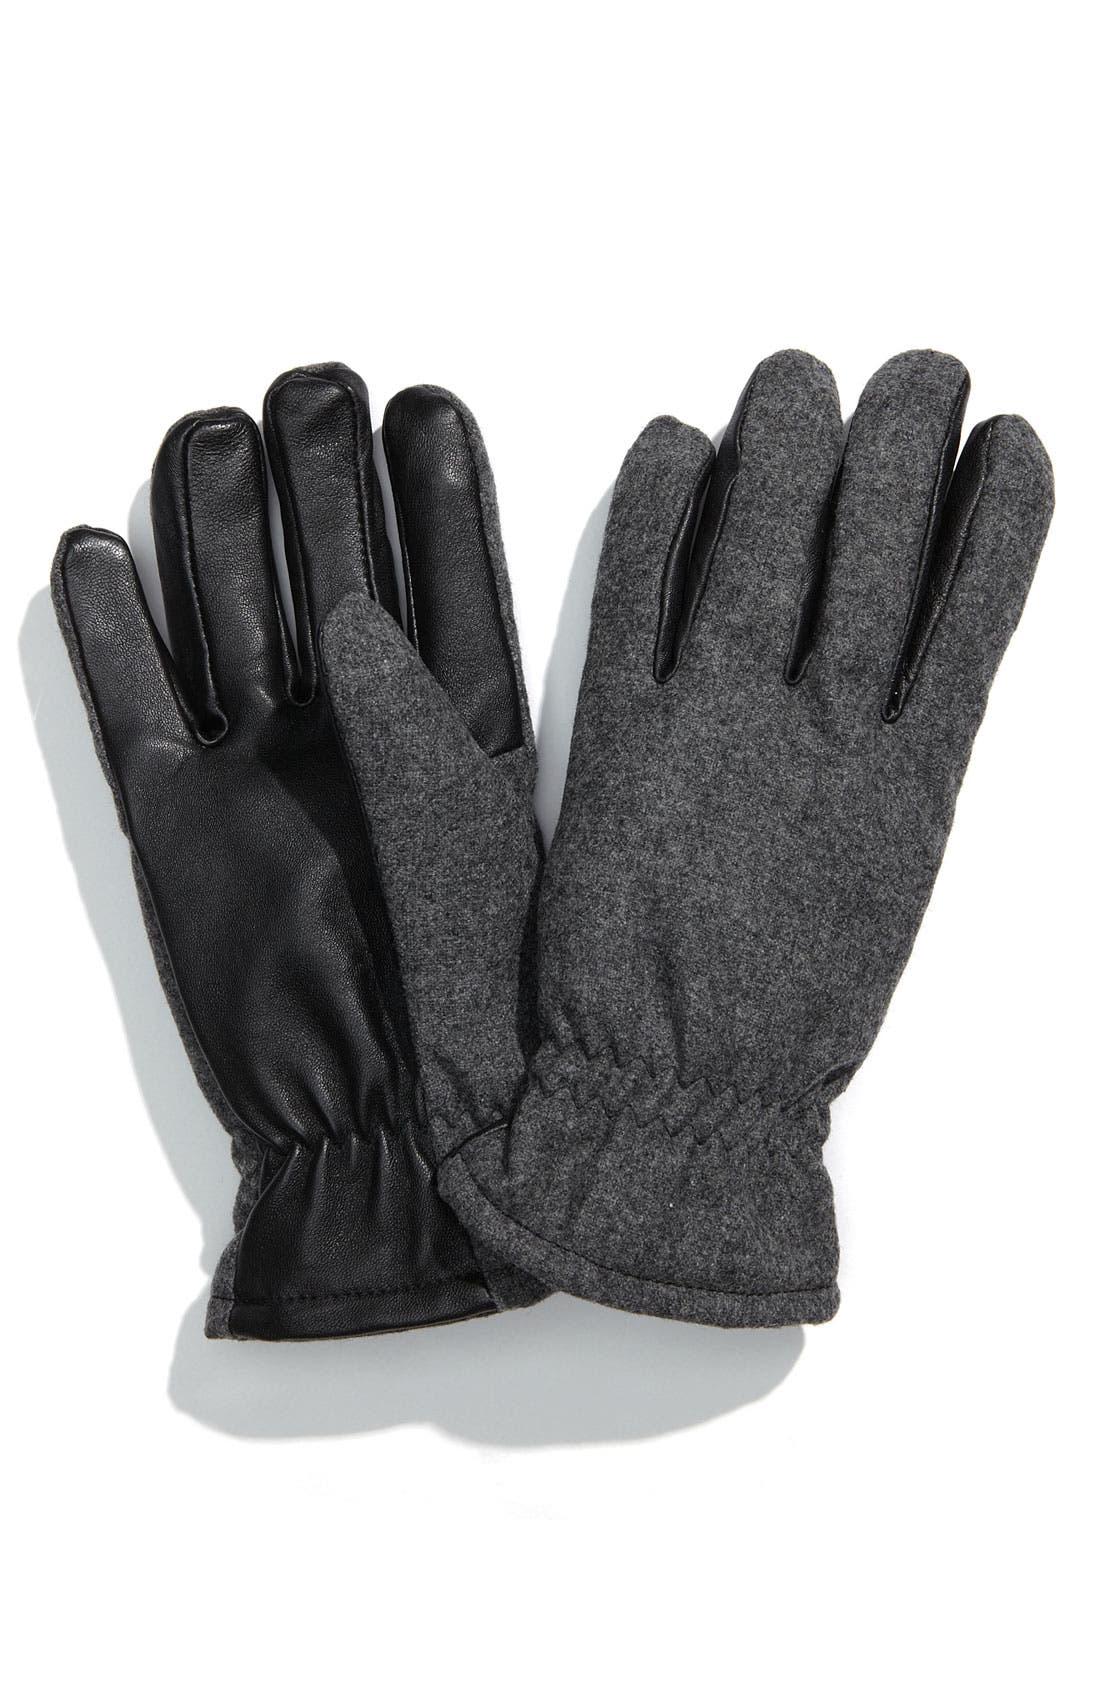 GRANDOE GLOVES 'Classic Sensor Touch' Gloves, Main, color, 098